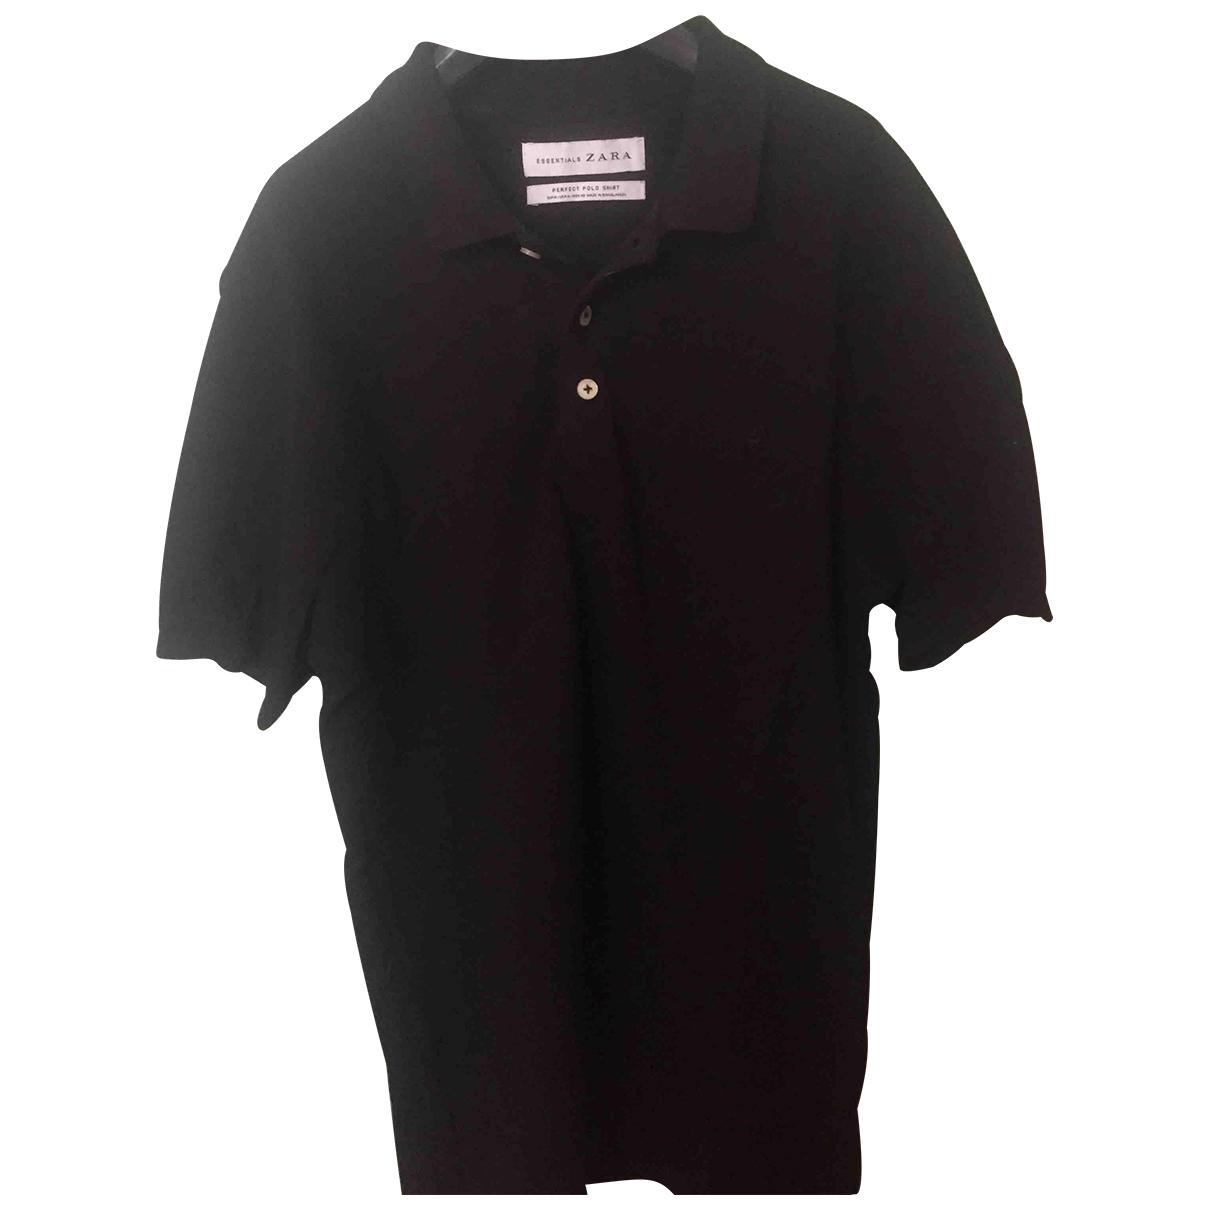 Zara \N Black Cotton T-shirts for Men M International